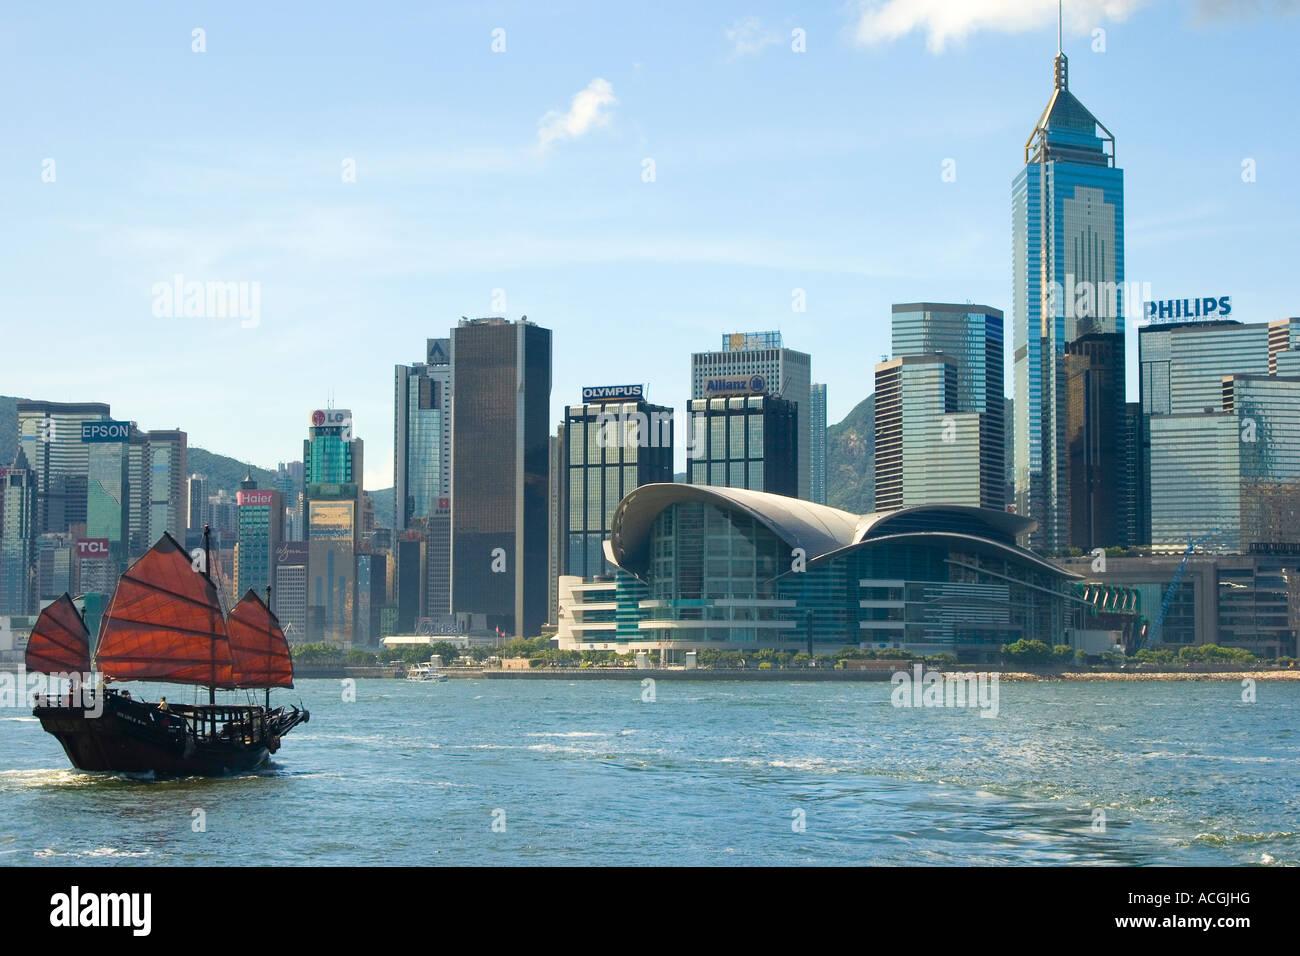 Duk Ling Cinese tradizionale Giunca Vela e Hong Kong Convention Centre di Hong Kong Cina Immagini Stock